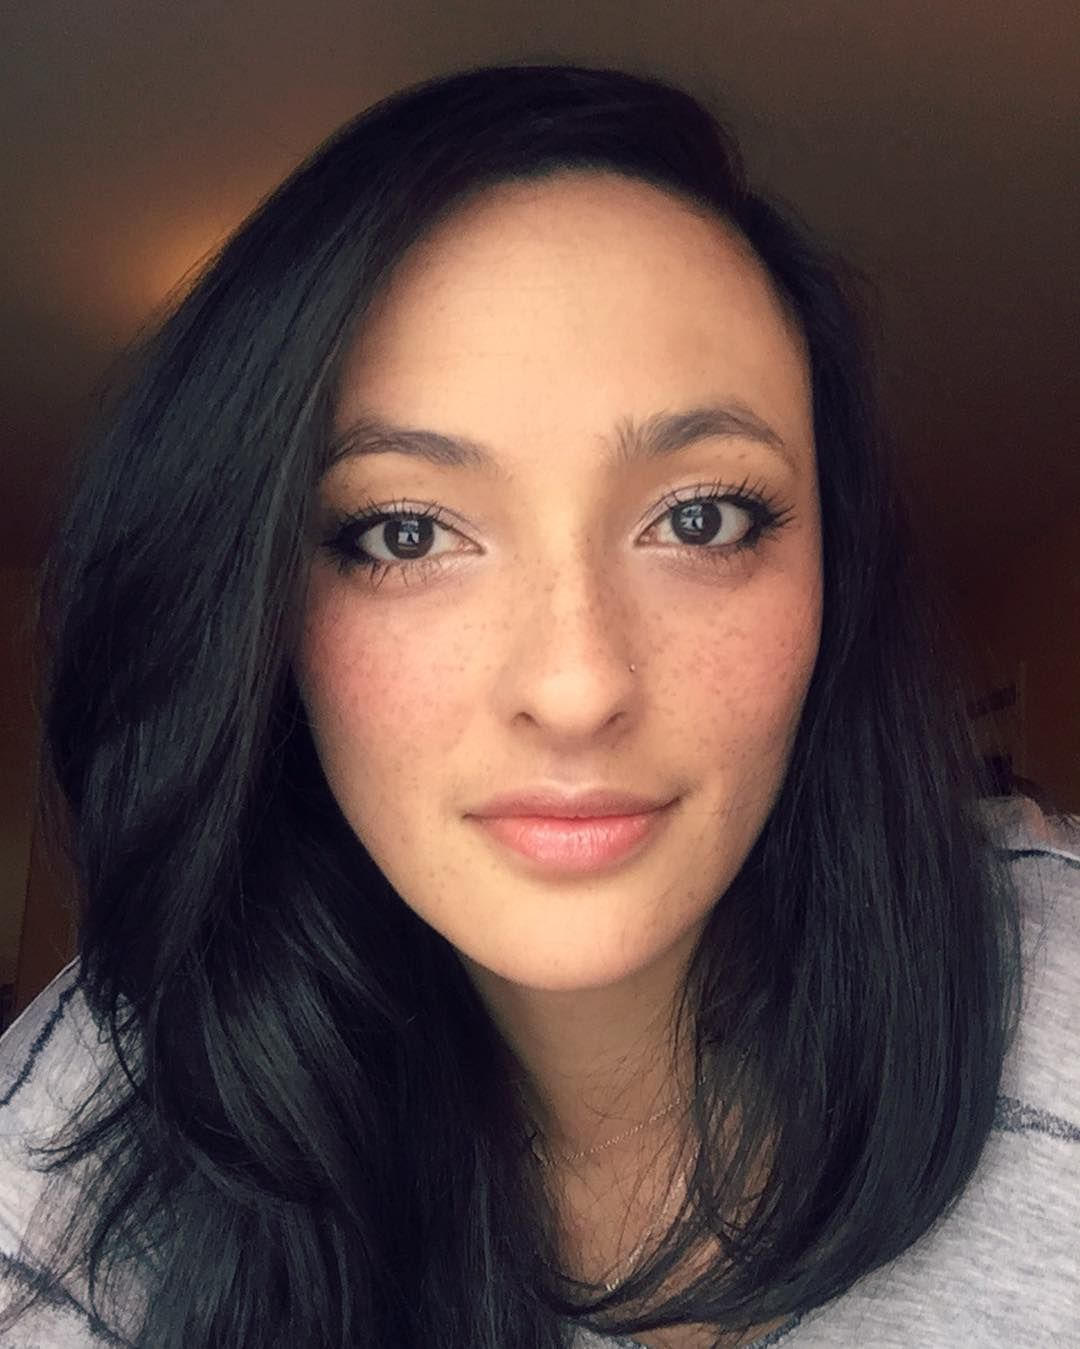 Wednesday morning makeup: tried awesome new concealers by @paulandjoe_beaute and @stilacosmetics  LipSurgence lip gloss by @tartecosmetics.  #rareselfie  #selfie #me #makeup #beauty #beautyaddict #instabeauty #photooftheday #hafu #ハーフ